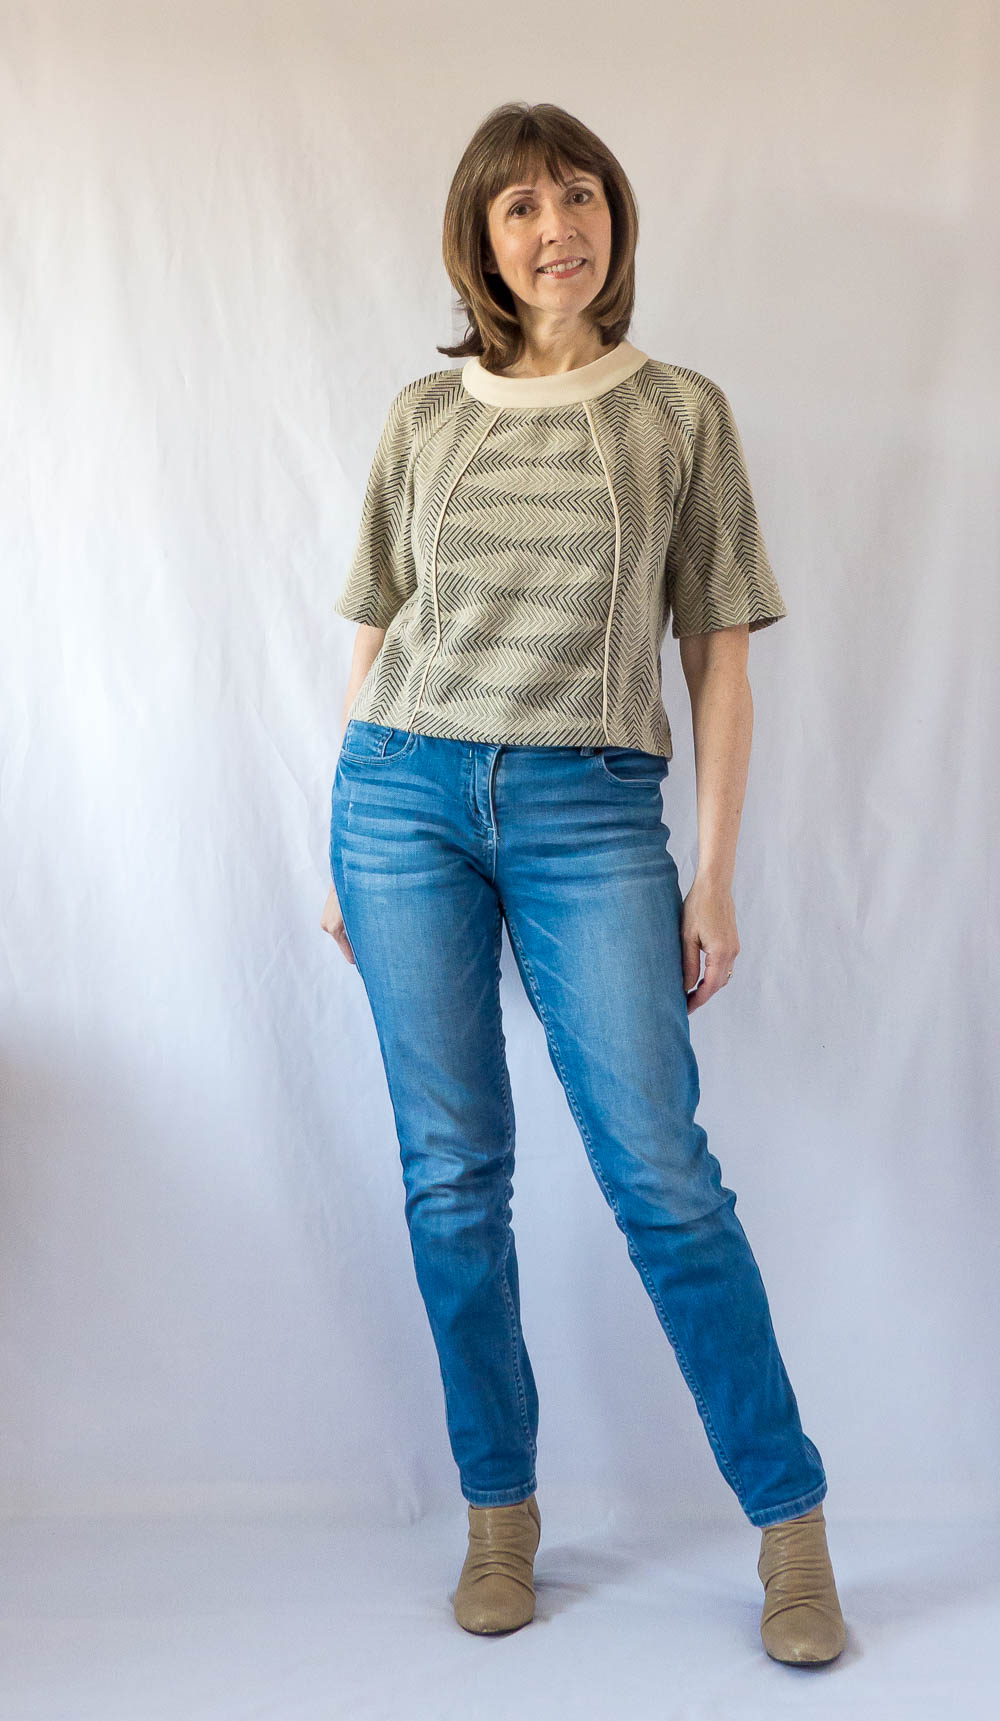 BurdaStyle year round-up: Short Sleeved Raglan Top